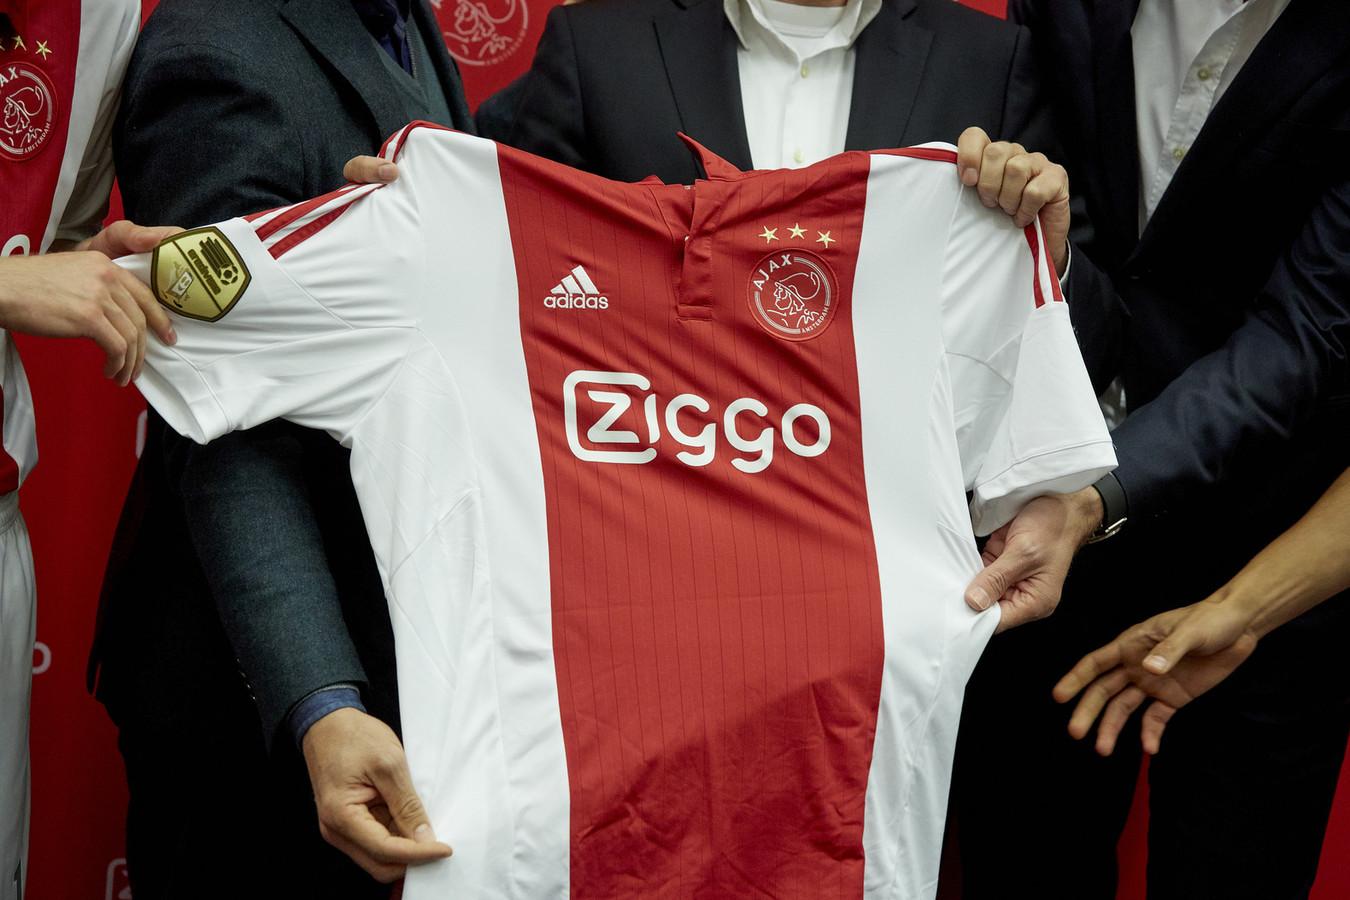 Kabelexploitant Ziggo als shirtsponsor